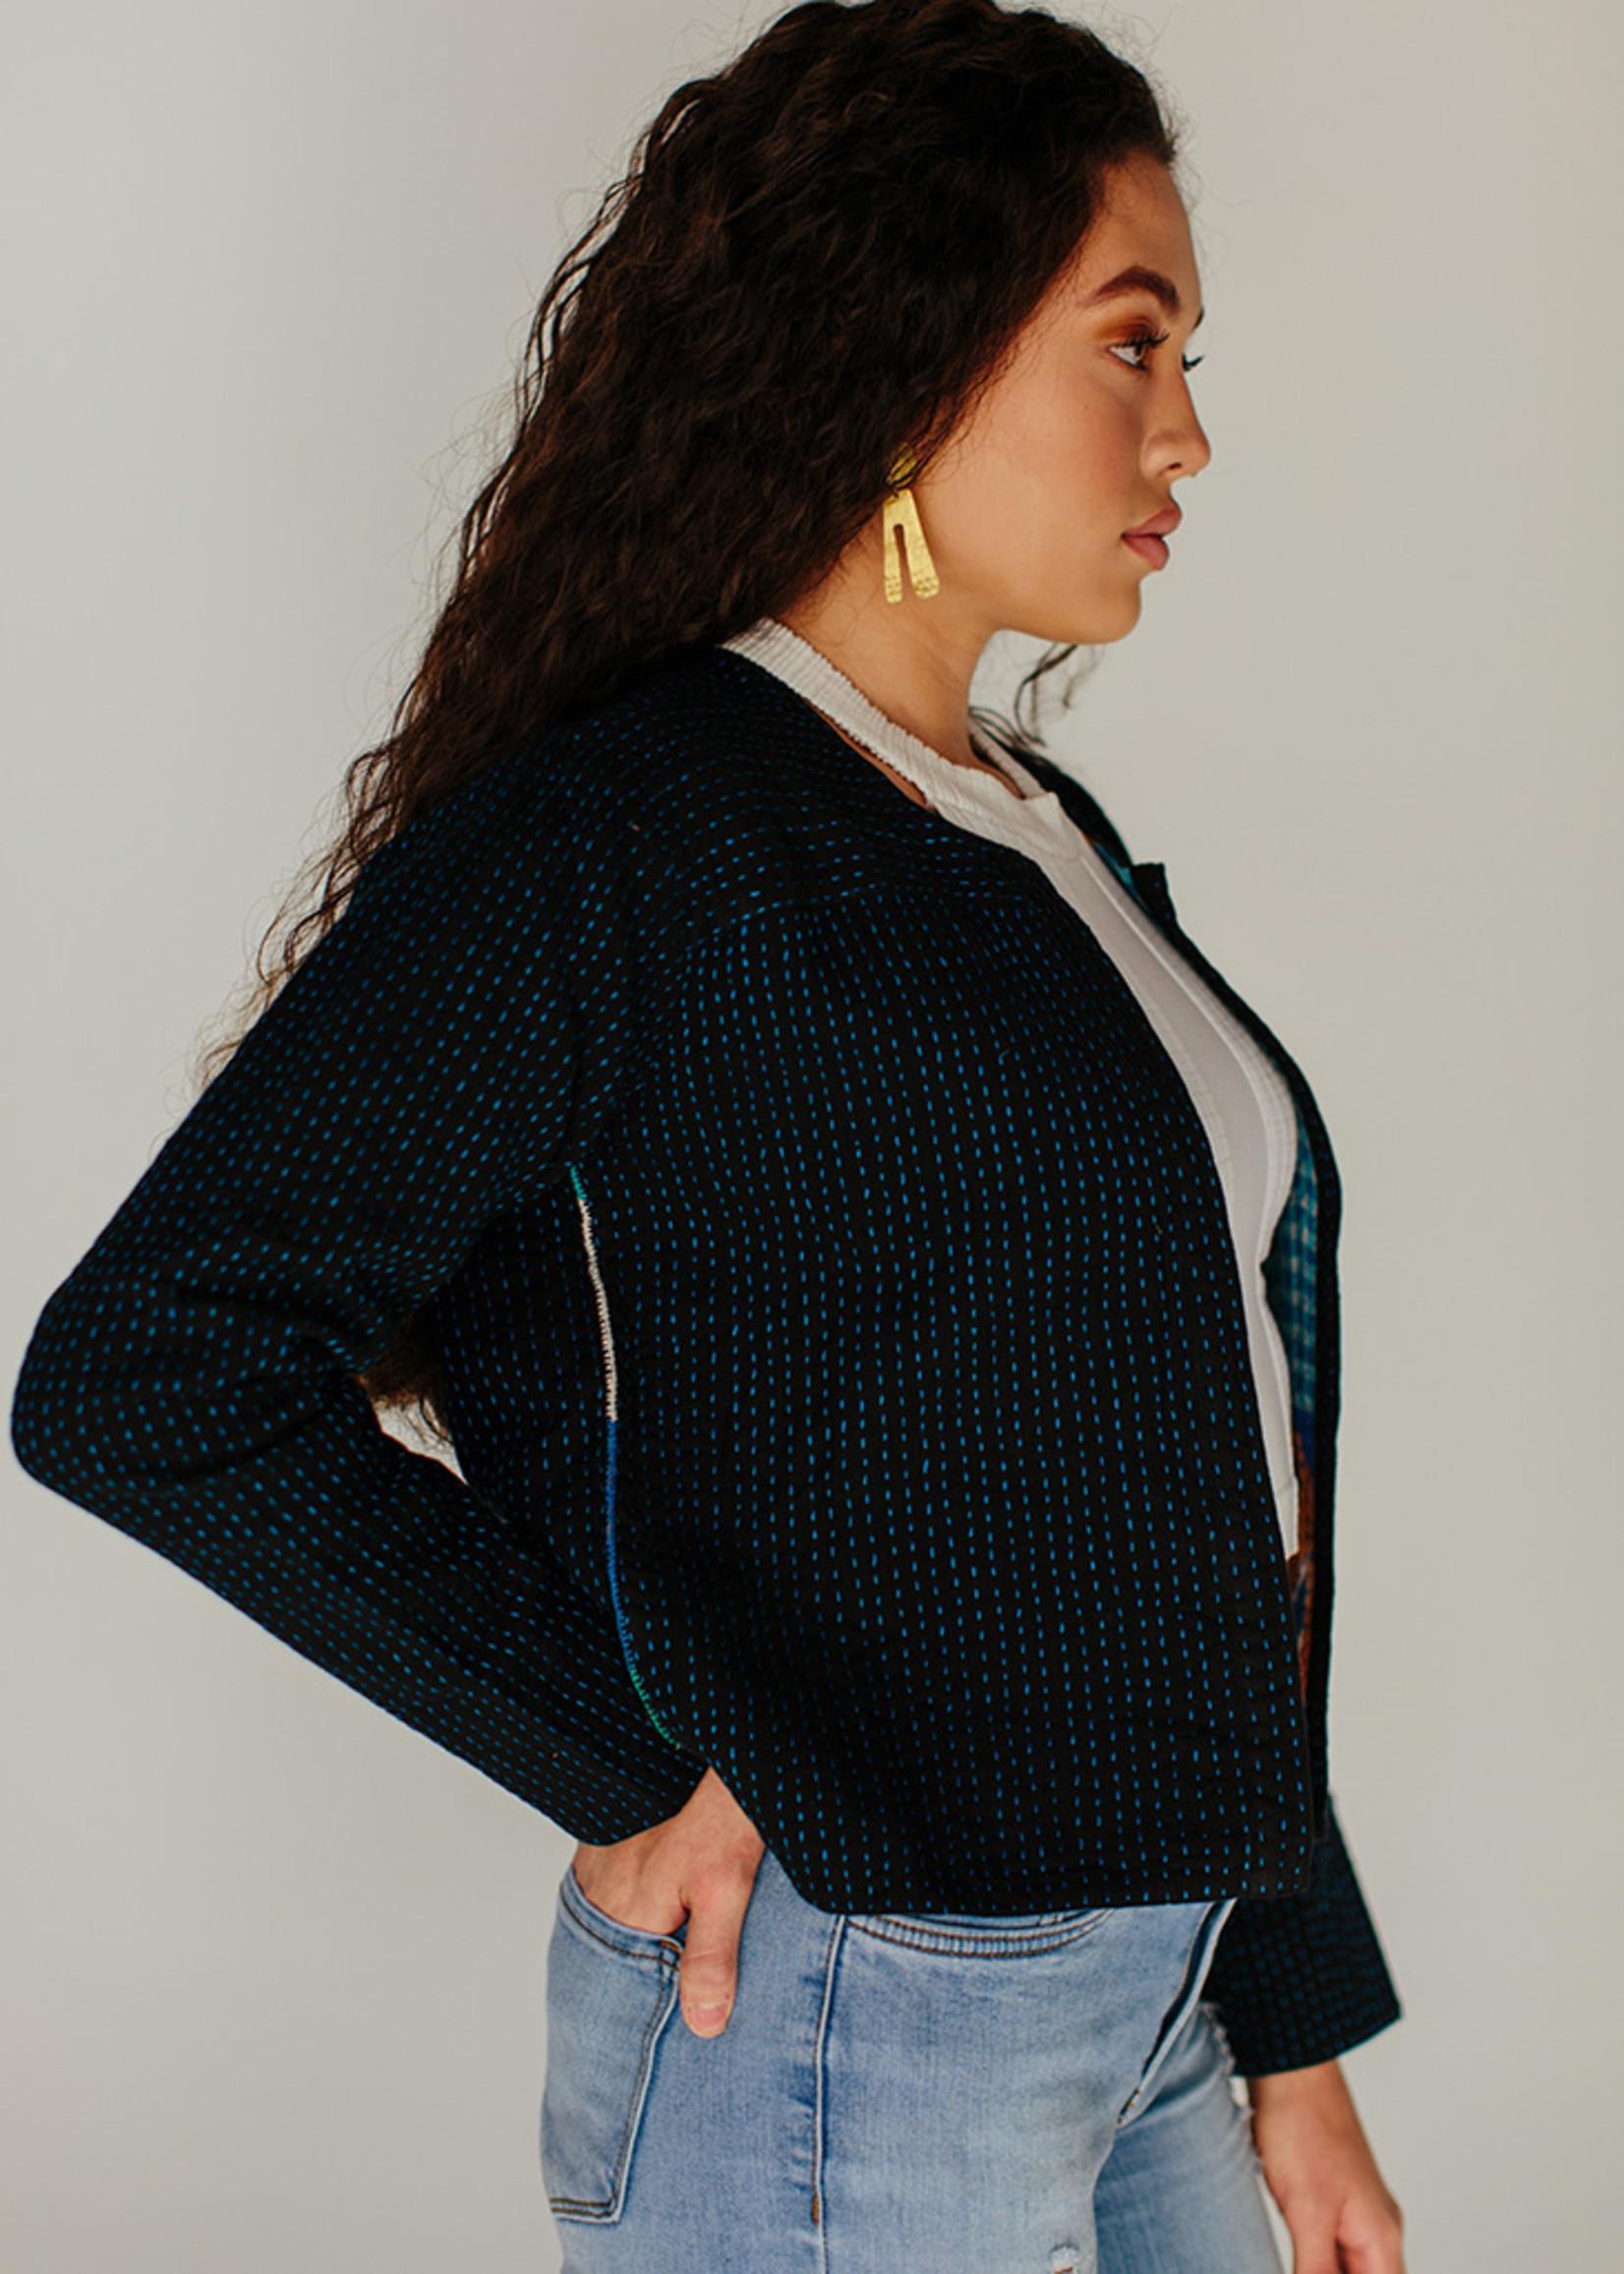 Blue Kantha Stitch Jacket